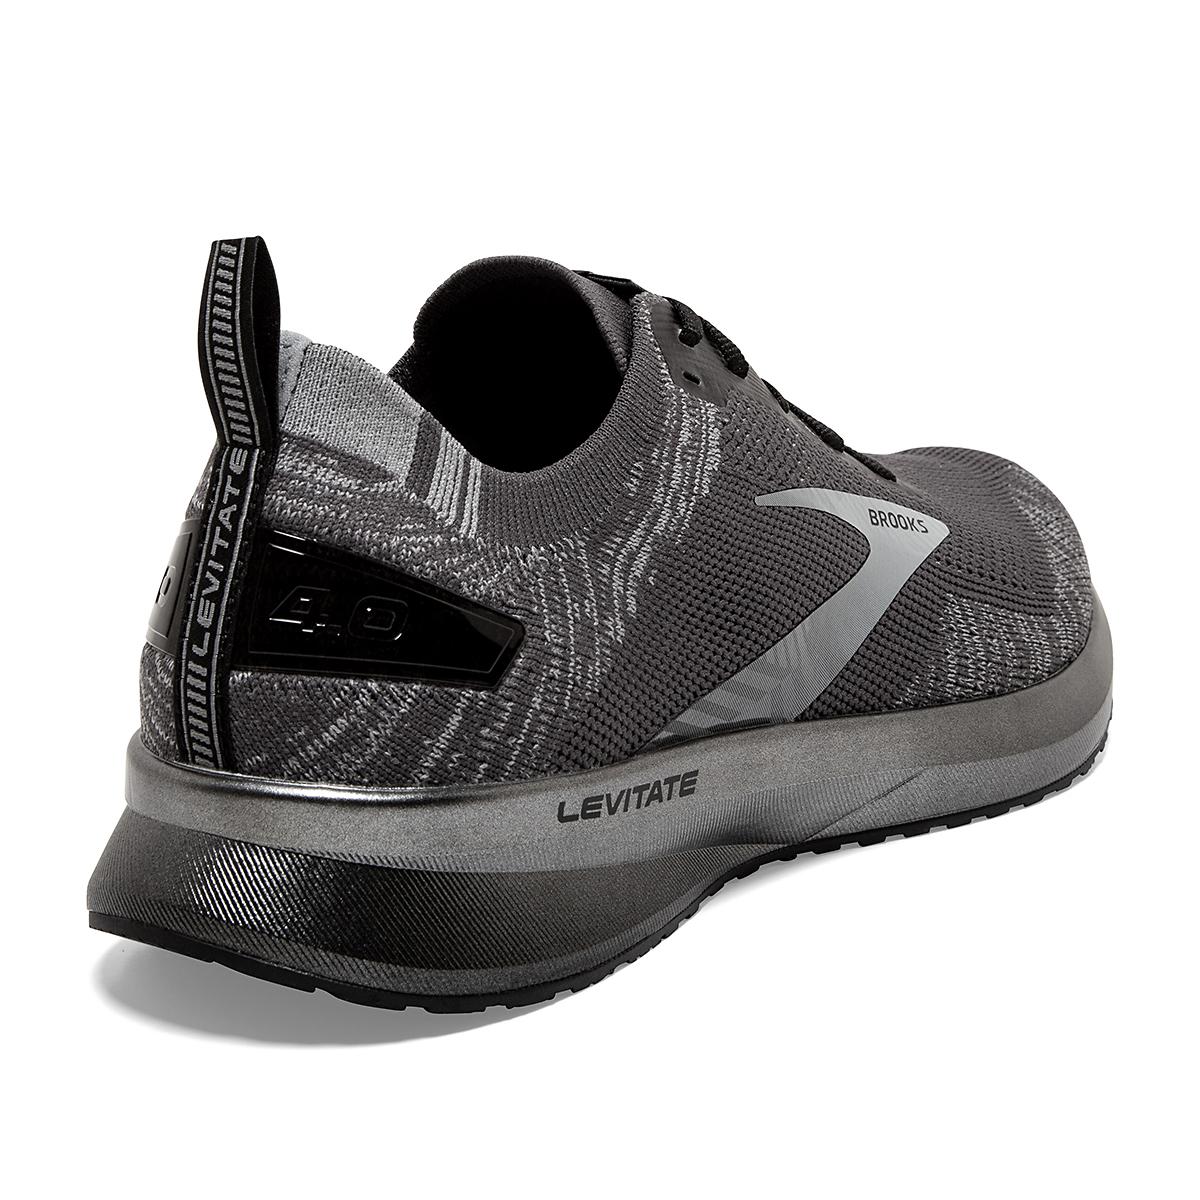 Men's Brooks Levitate 4 Running Shoe - Color: Blackened Pearl/Grey/Black - Size: 8 - Width: Regular, Blackened Pearl/Grey/Black, large, image 3